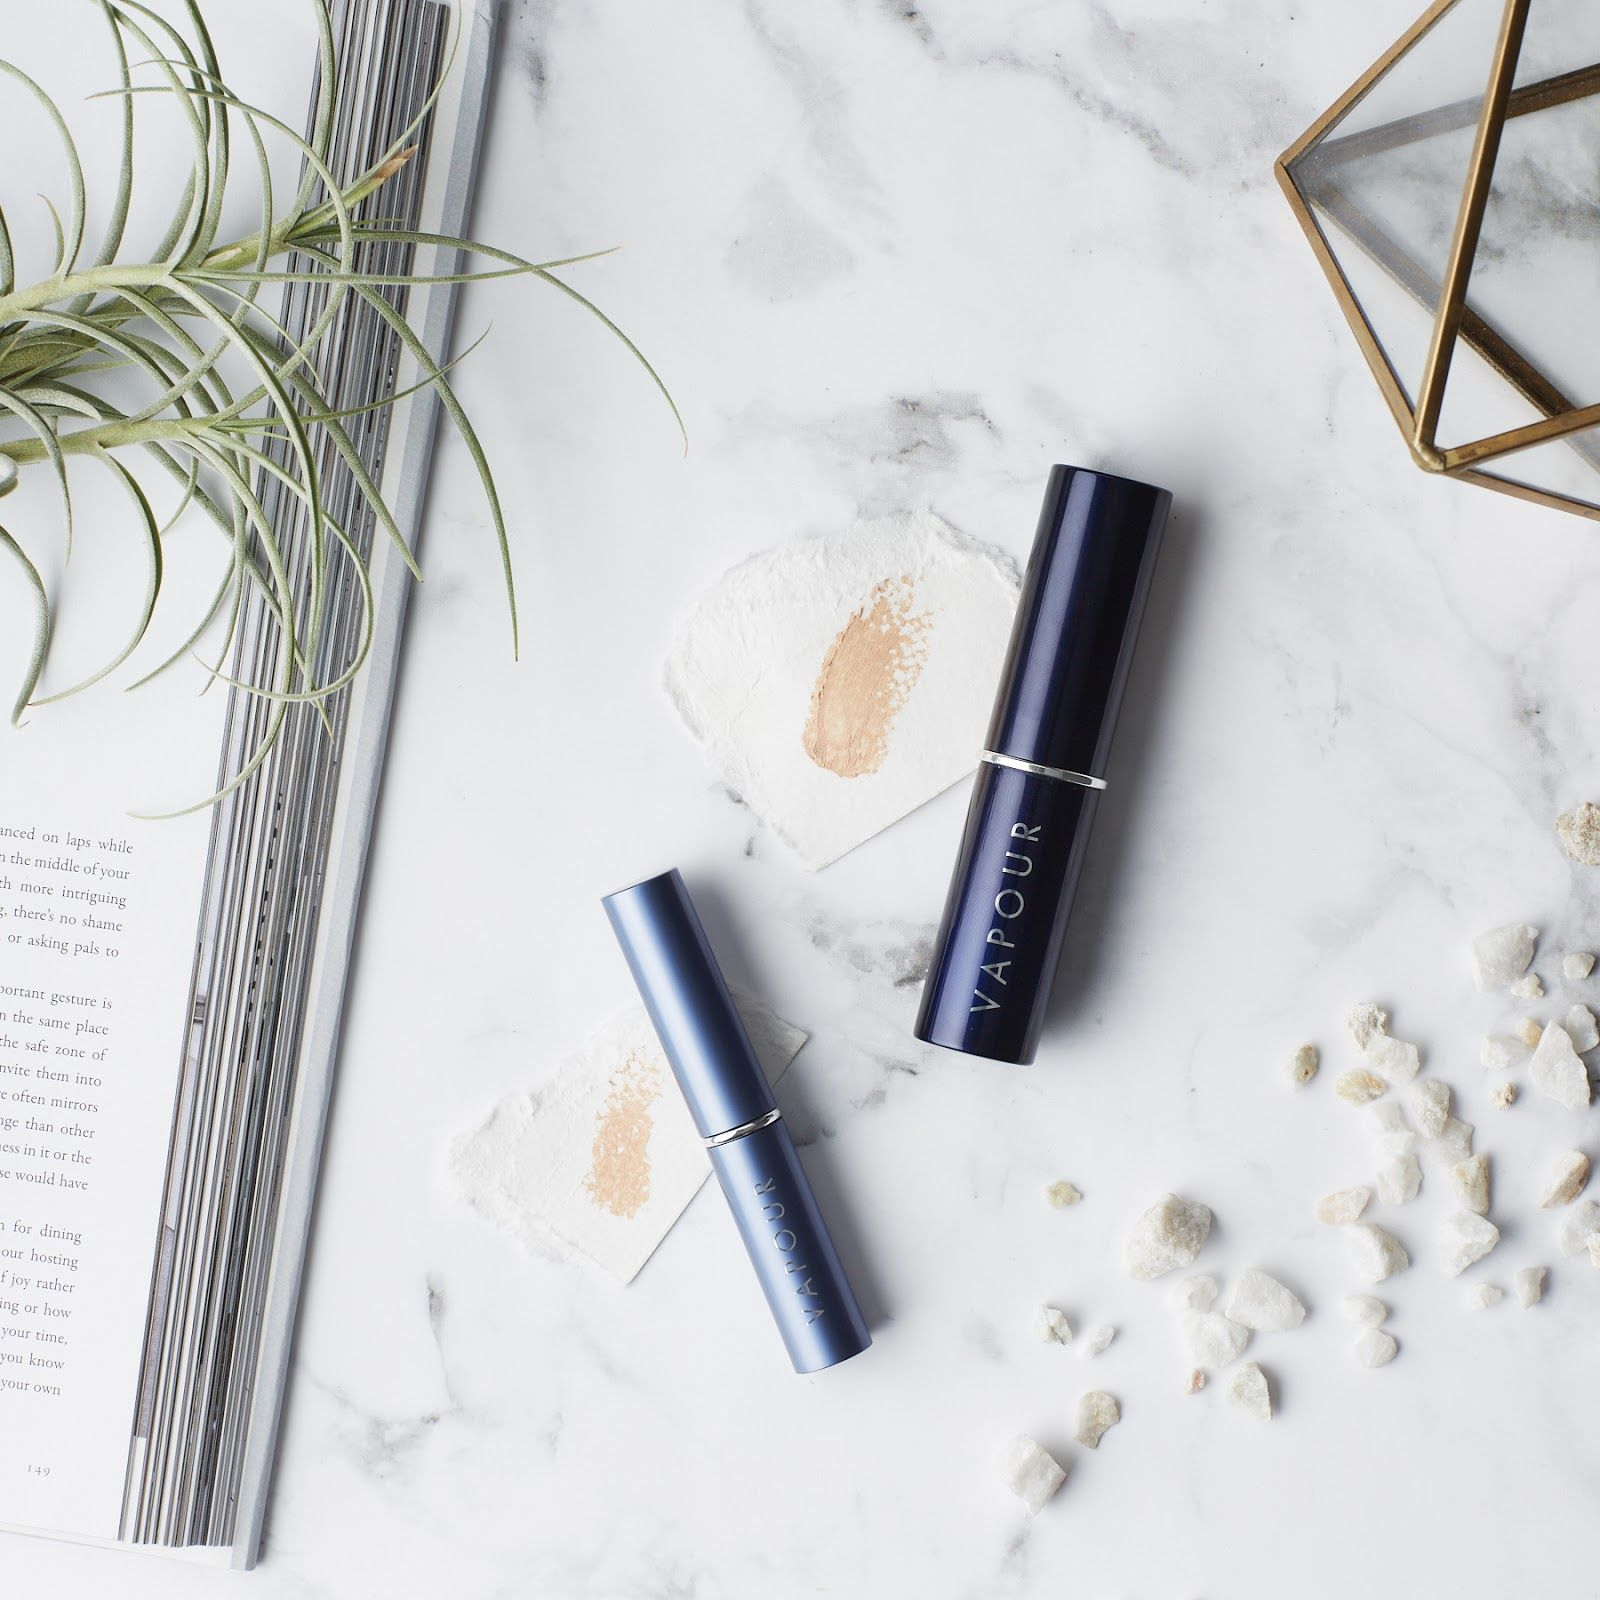 Vapour Organic Beauty Concealer 70 Organic Ingredients